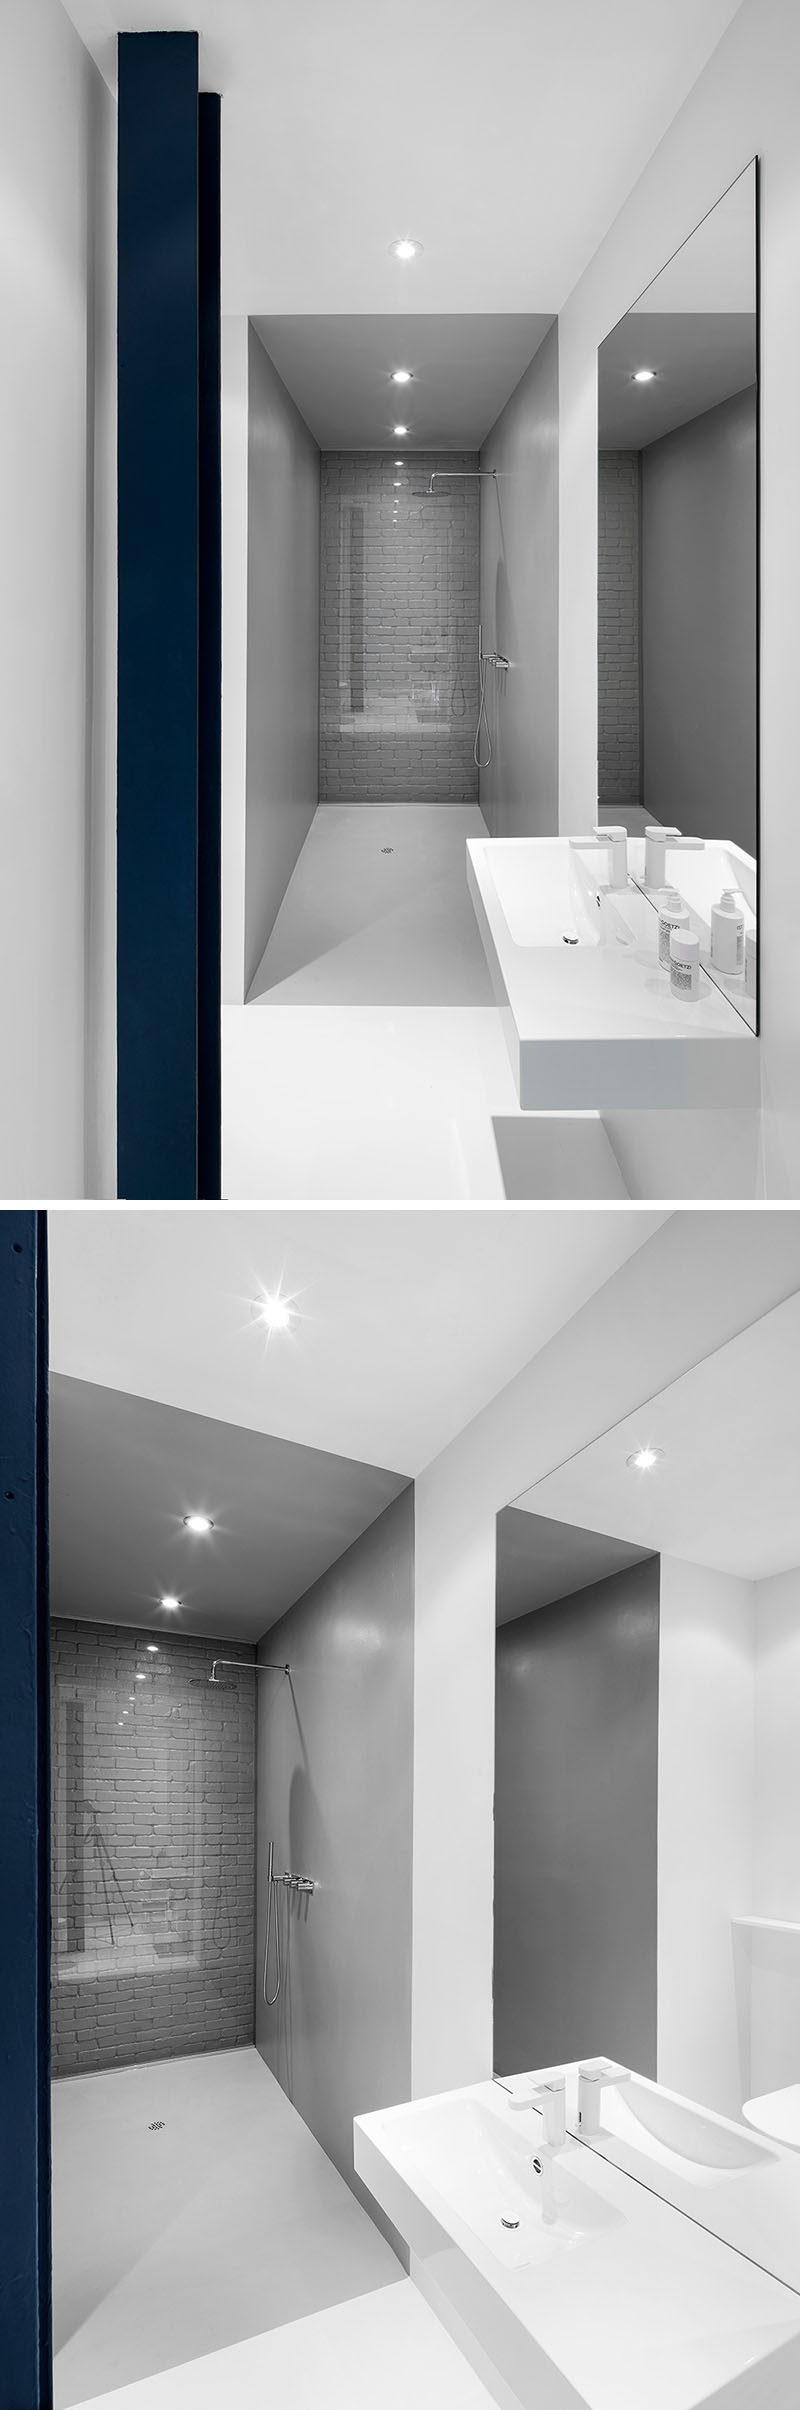 Bathroom Design Idea - Use Glass To Cover An Original Brick Wall In The Bathroom So You Can Still Enjoy It